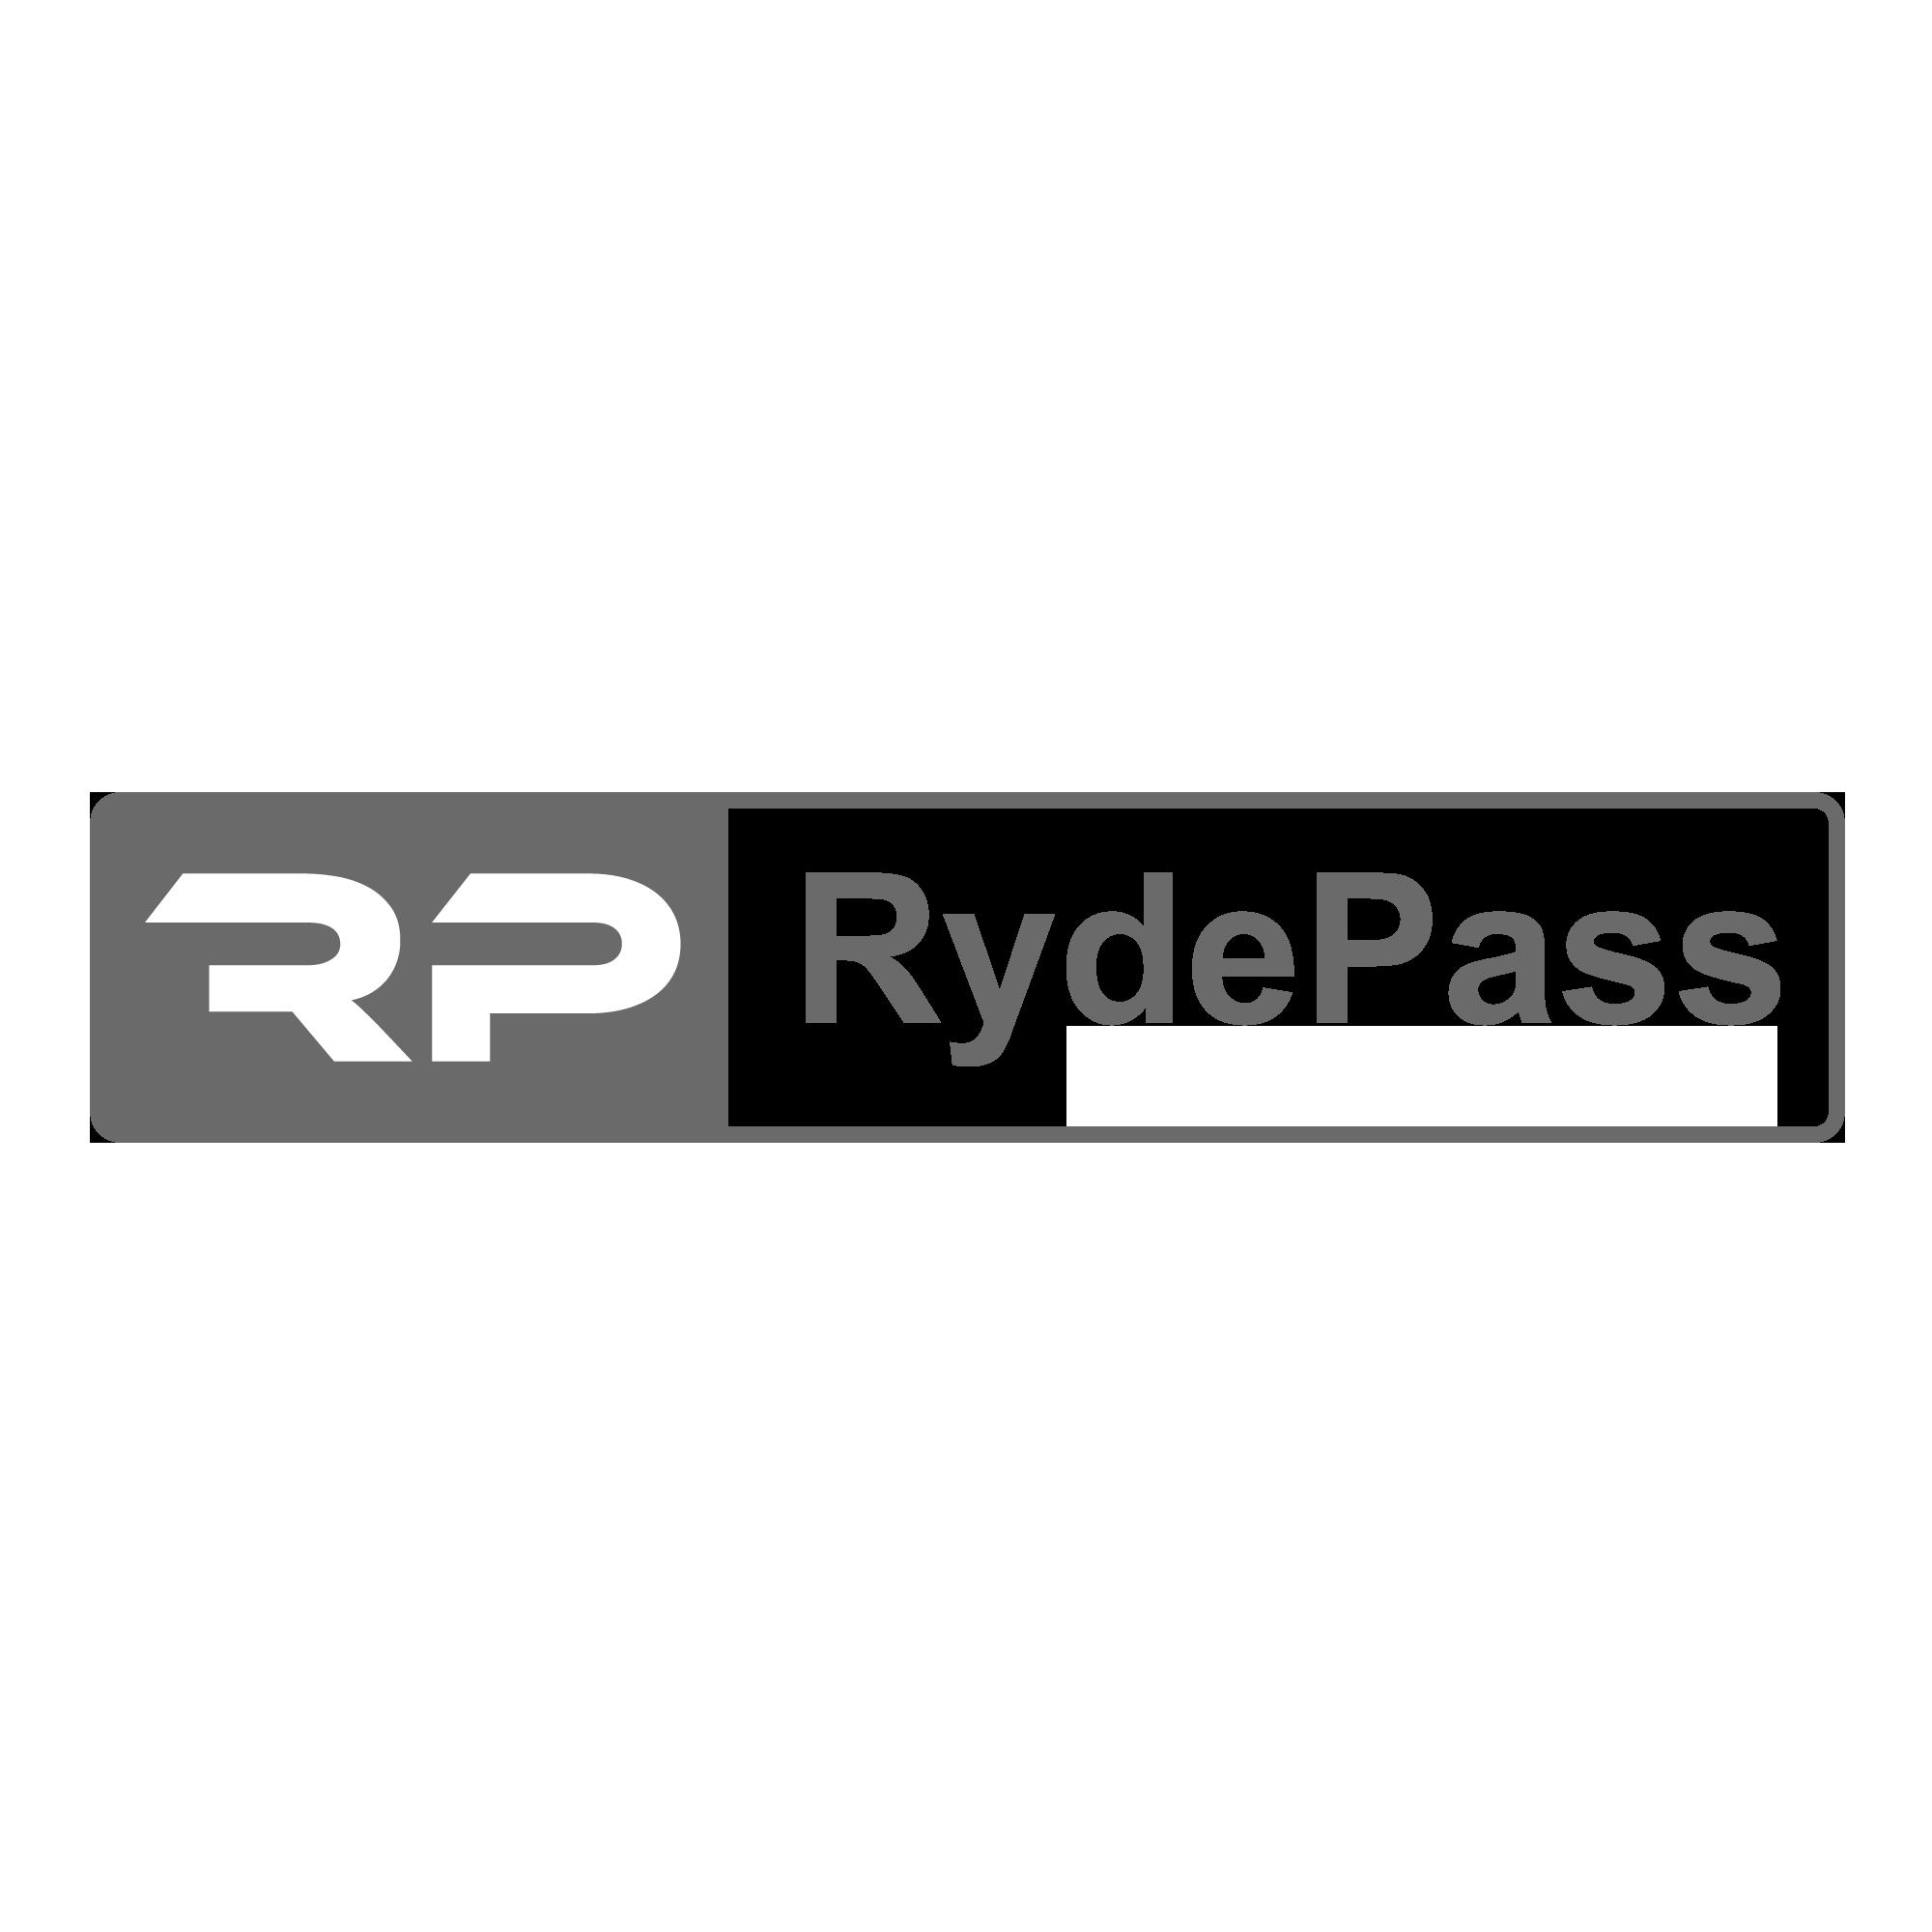 Copy of RydepassLogo.png